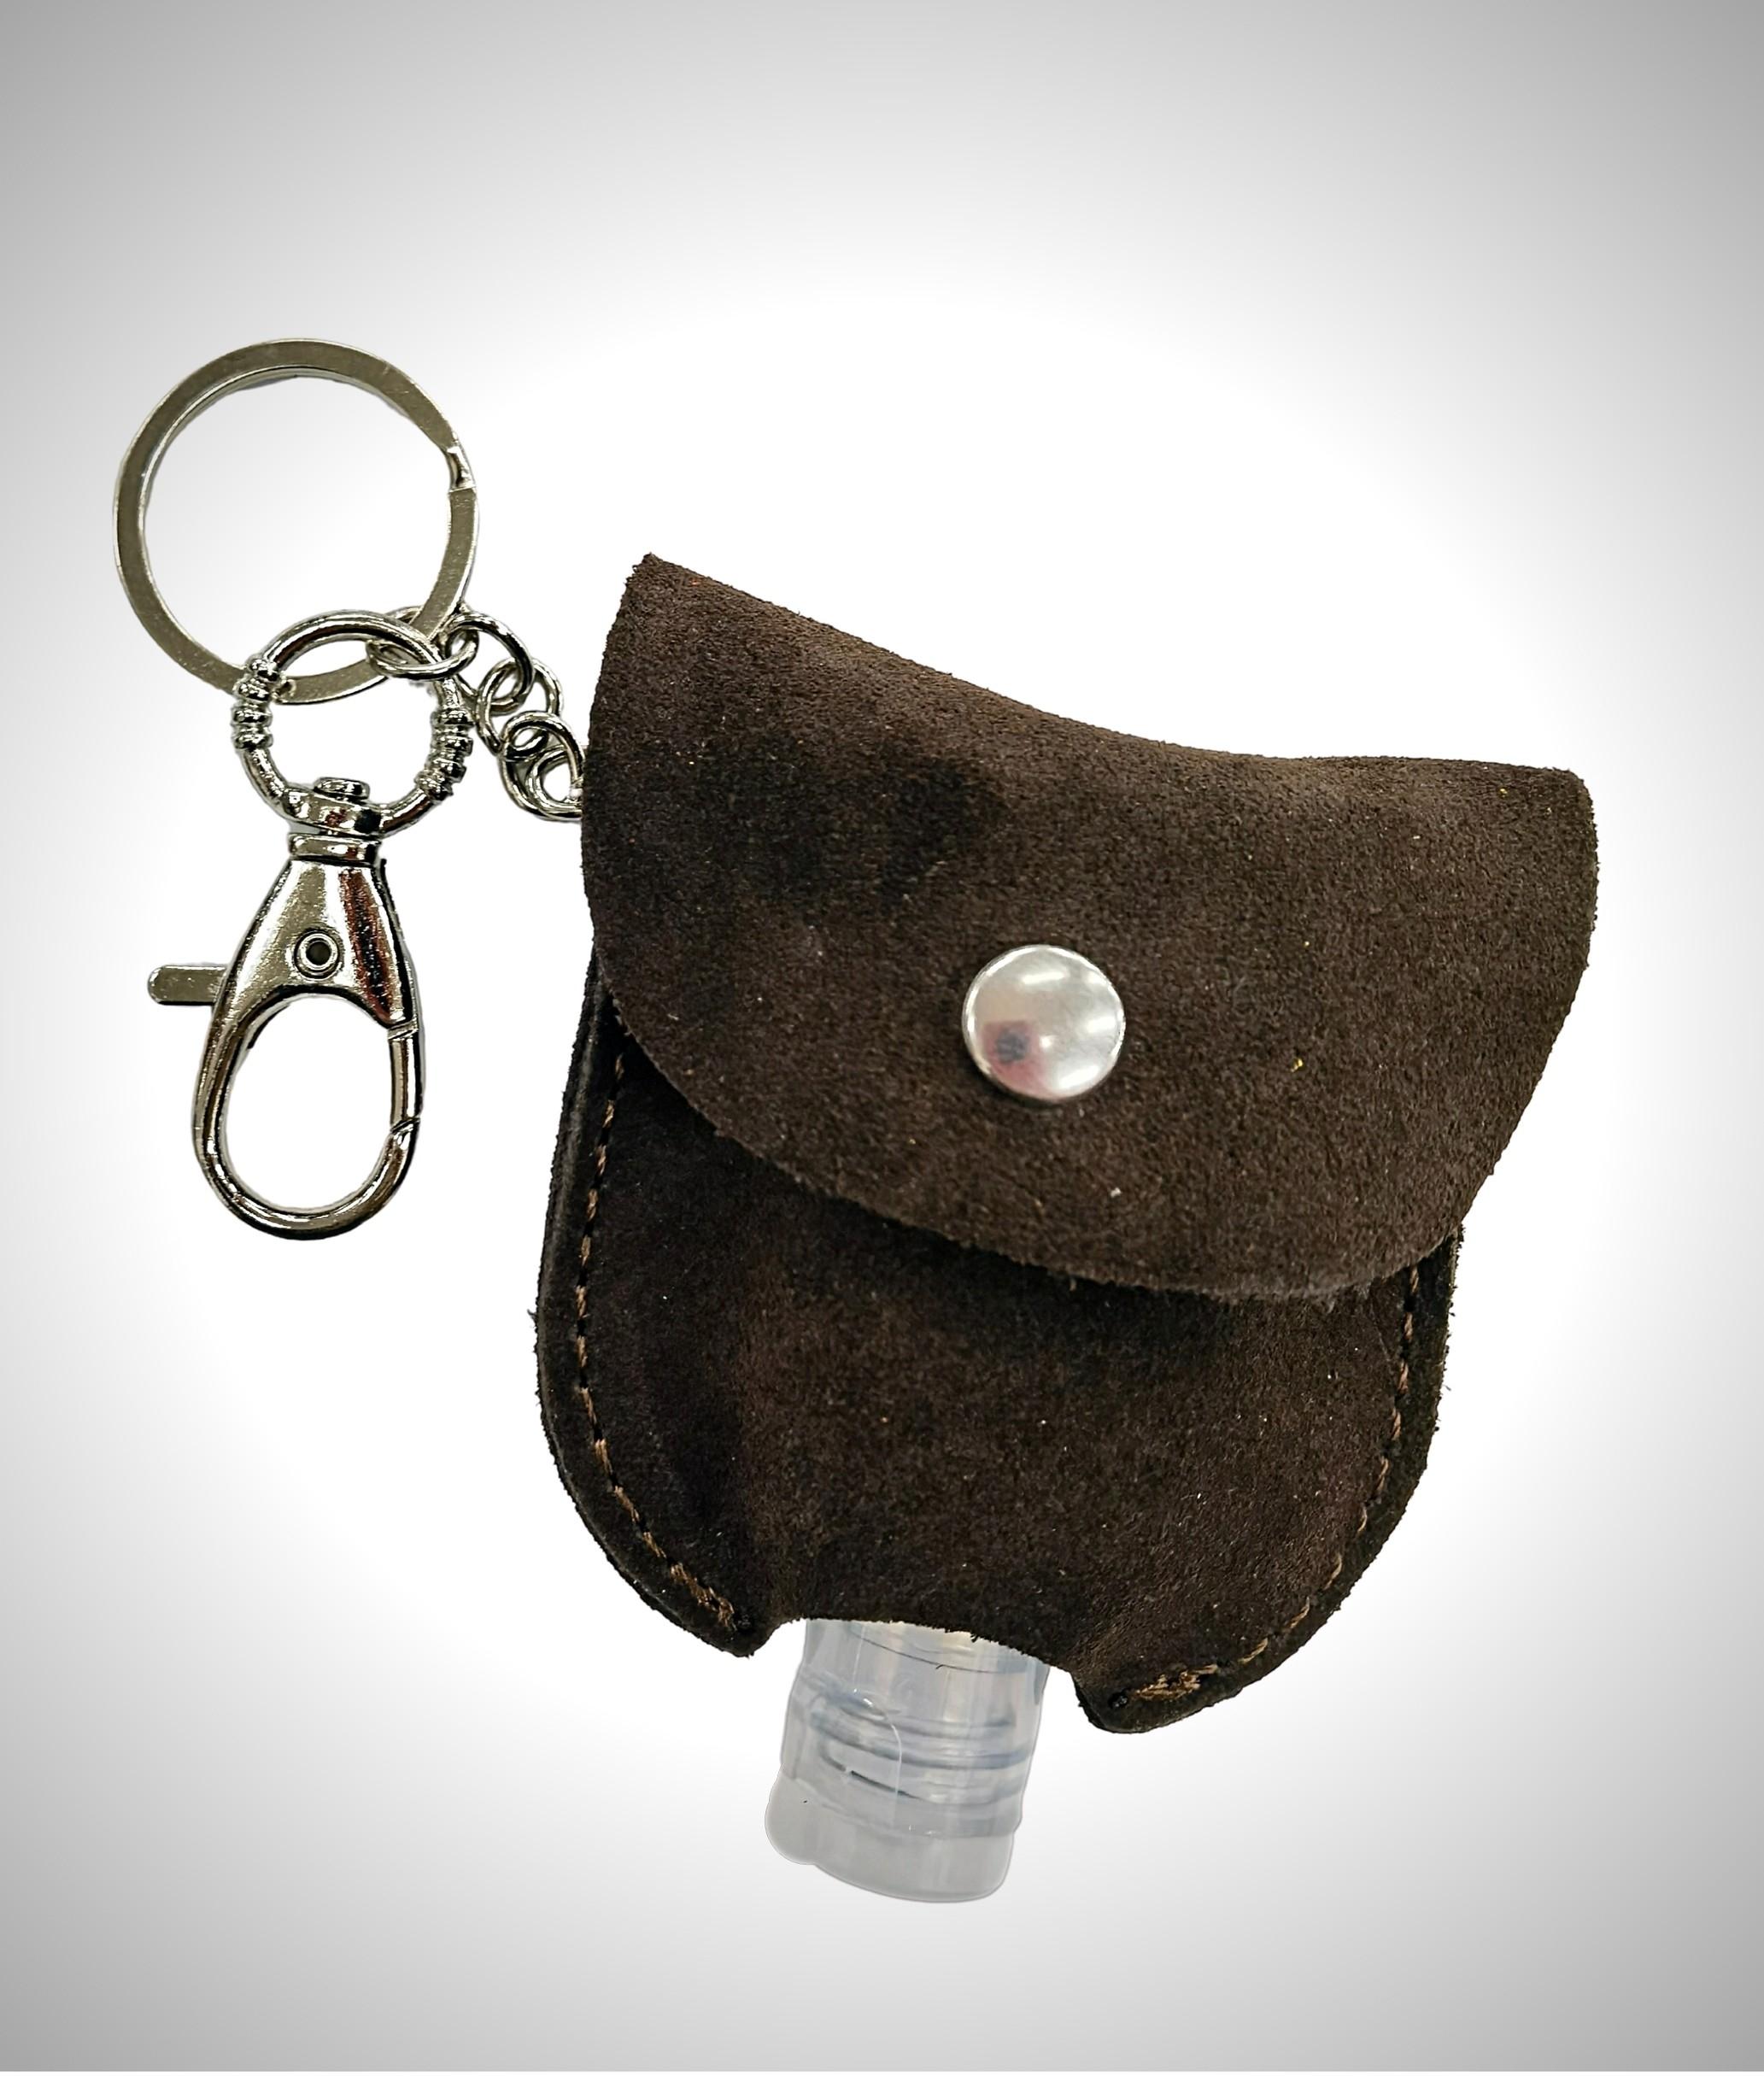 Porte-clés en cuir porte-gel - vert